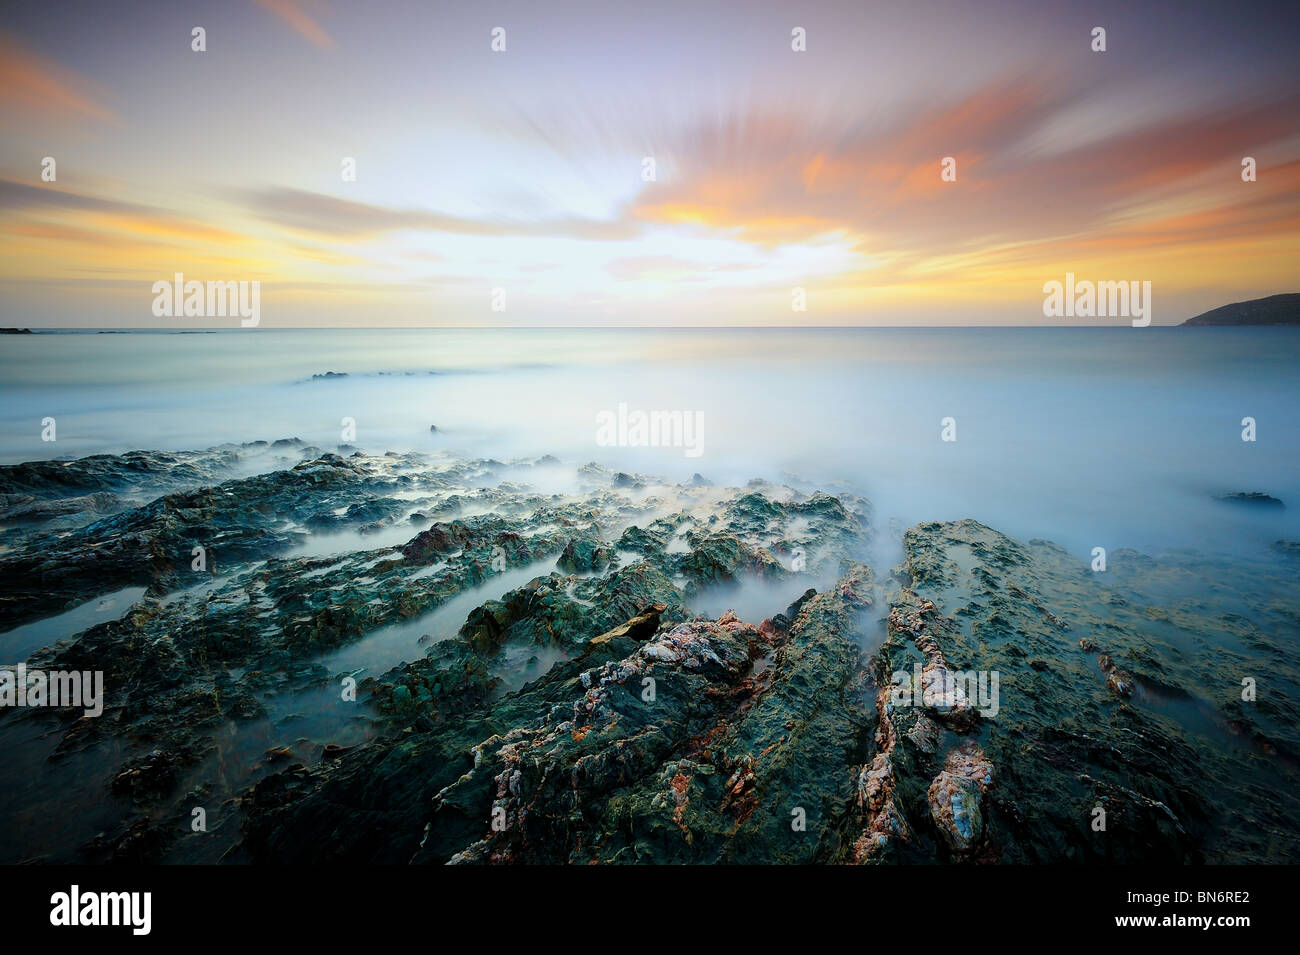 Moody seascape at sunset Photo Stock